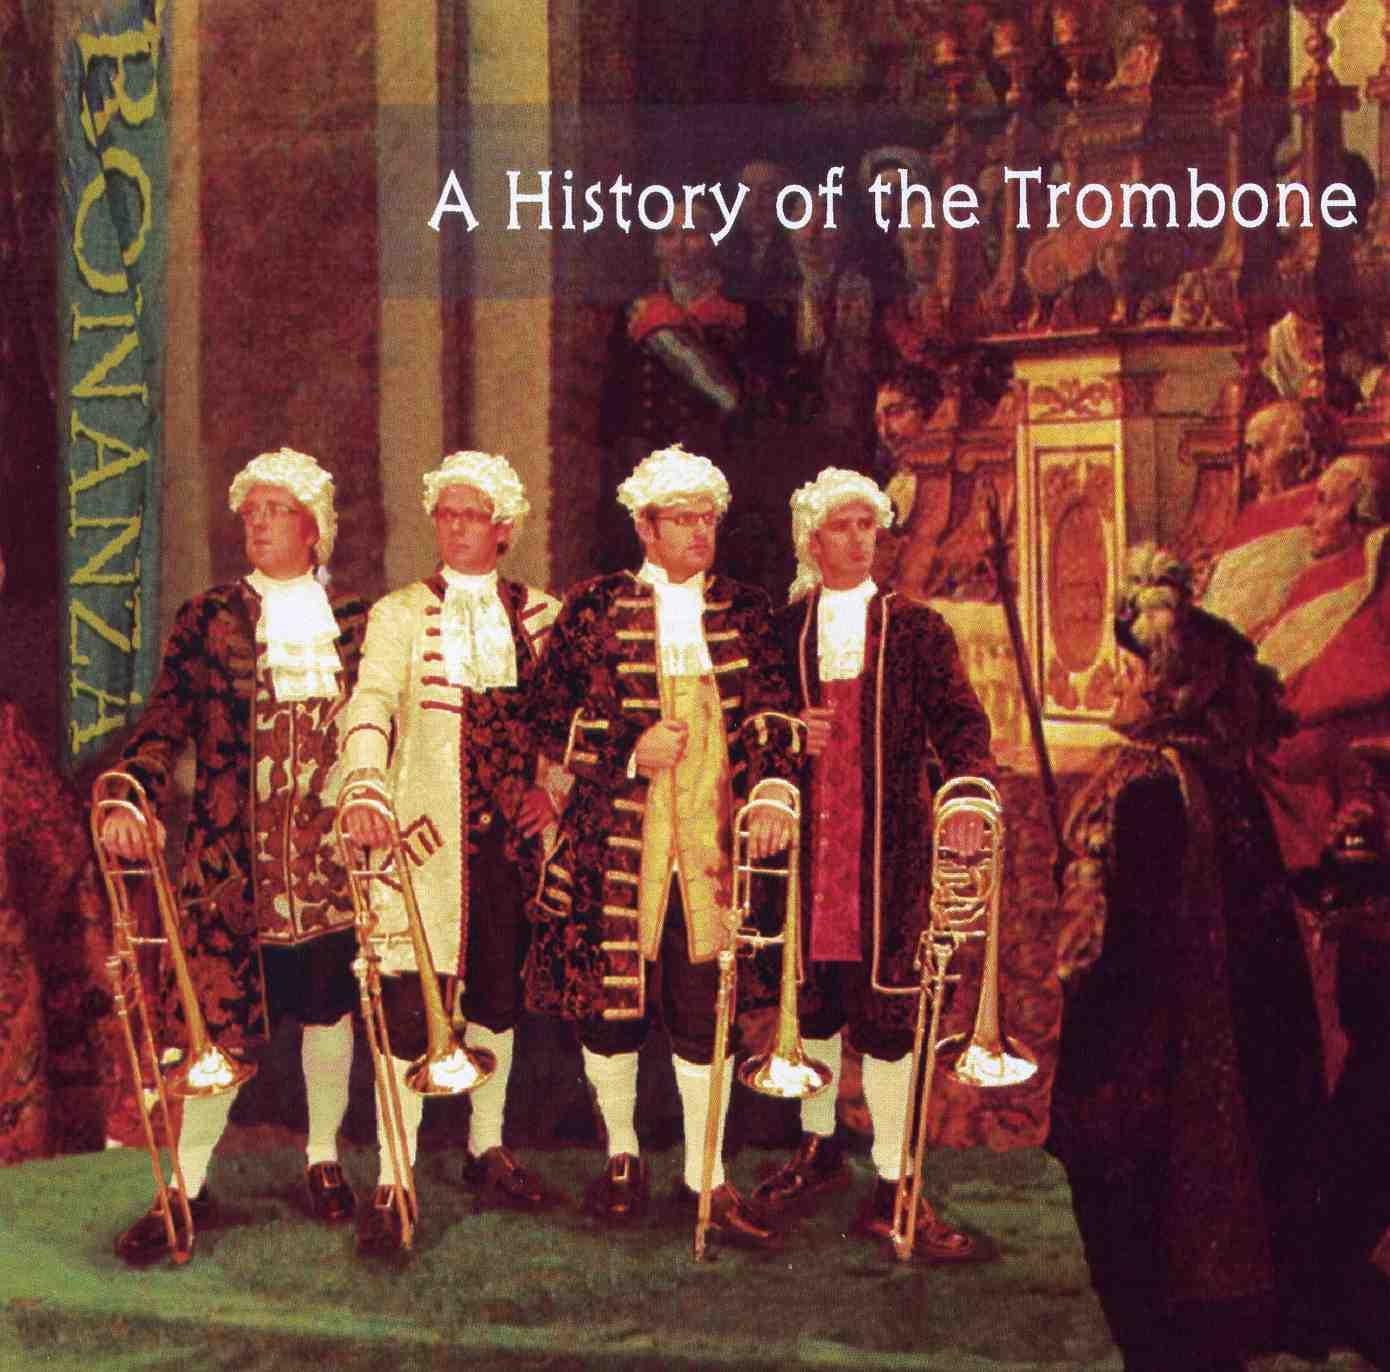 BonaNZa: A History of the Trombone - CD